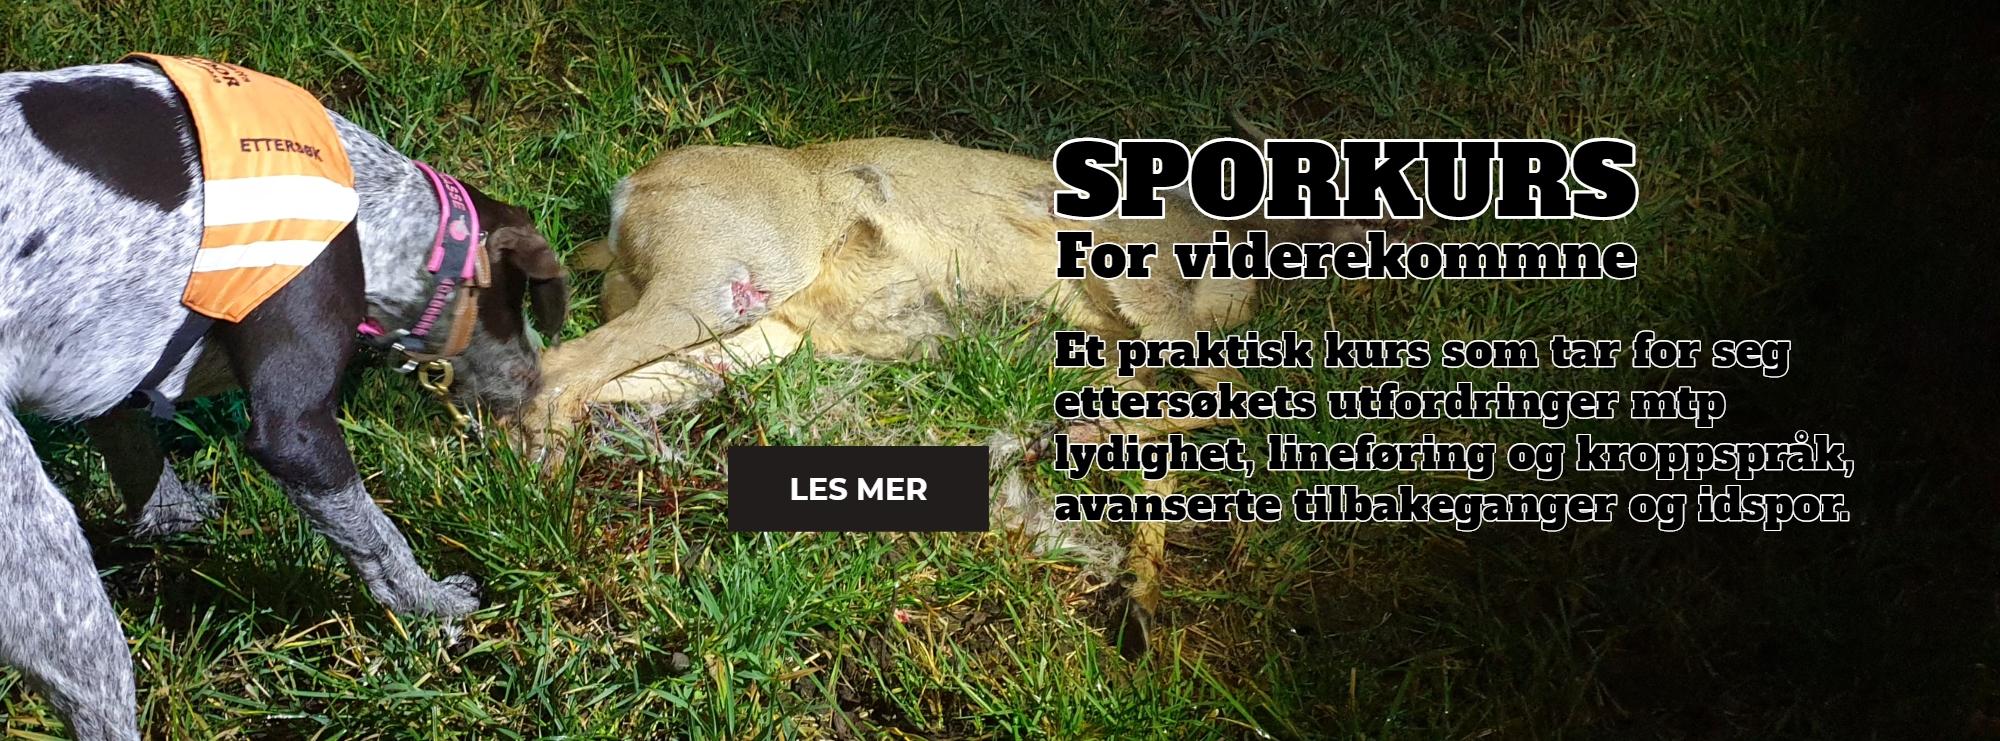 Sporkurs_VG